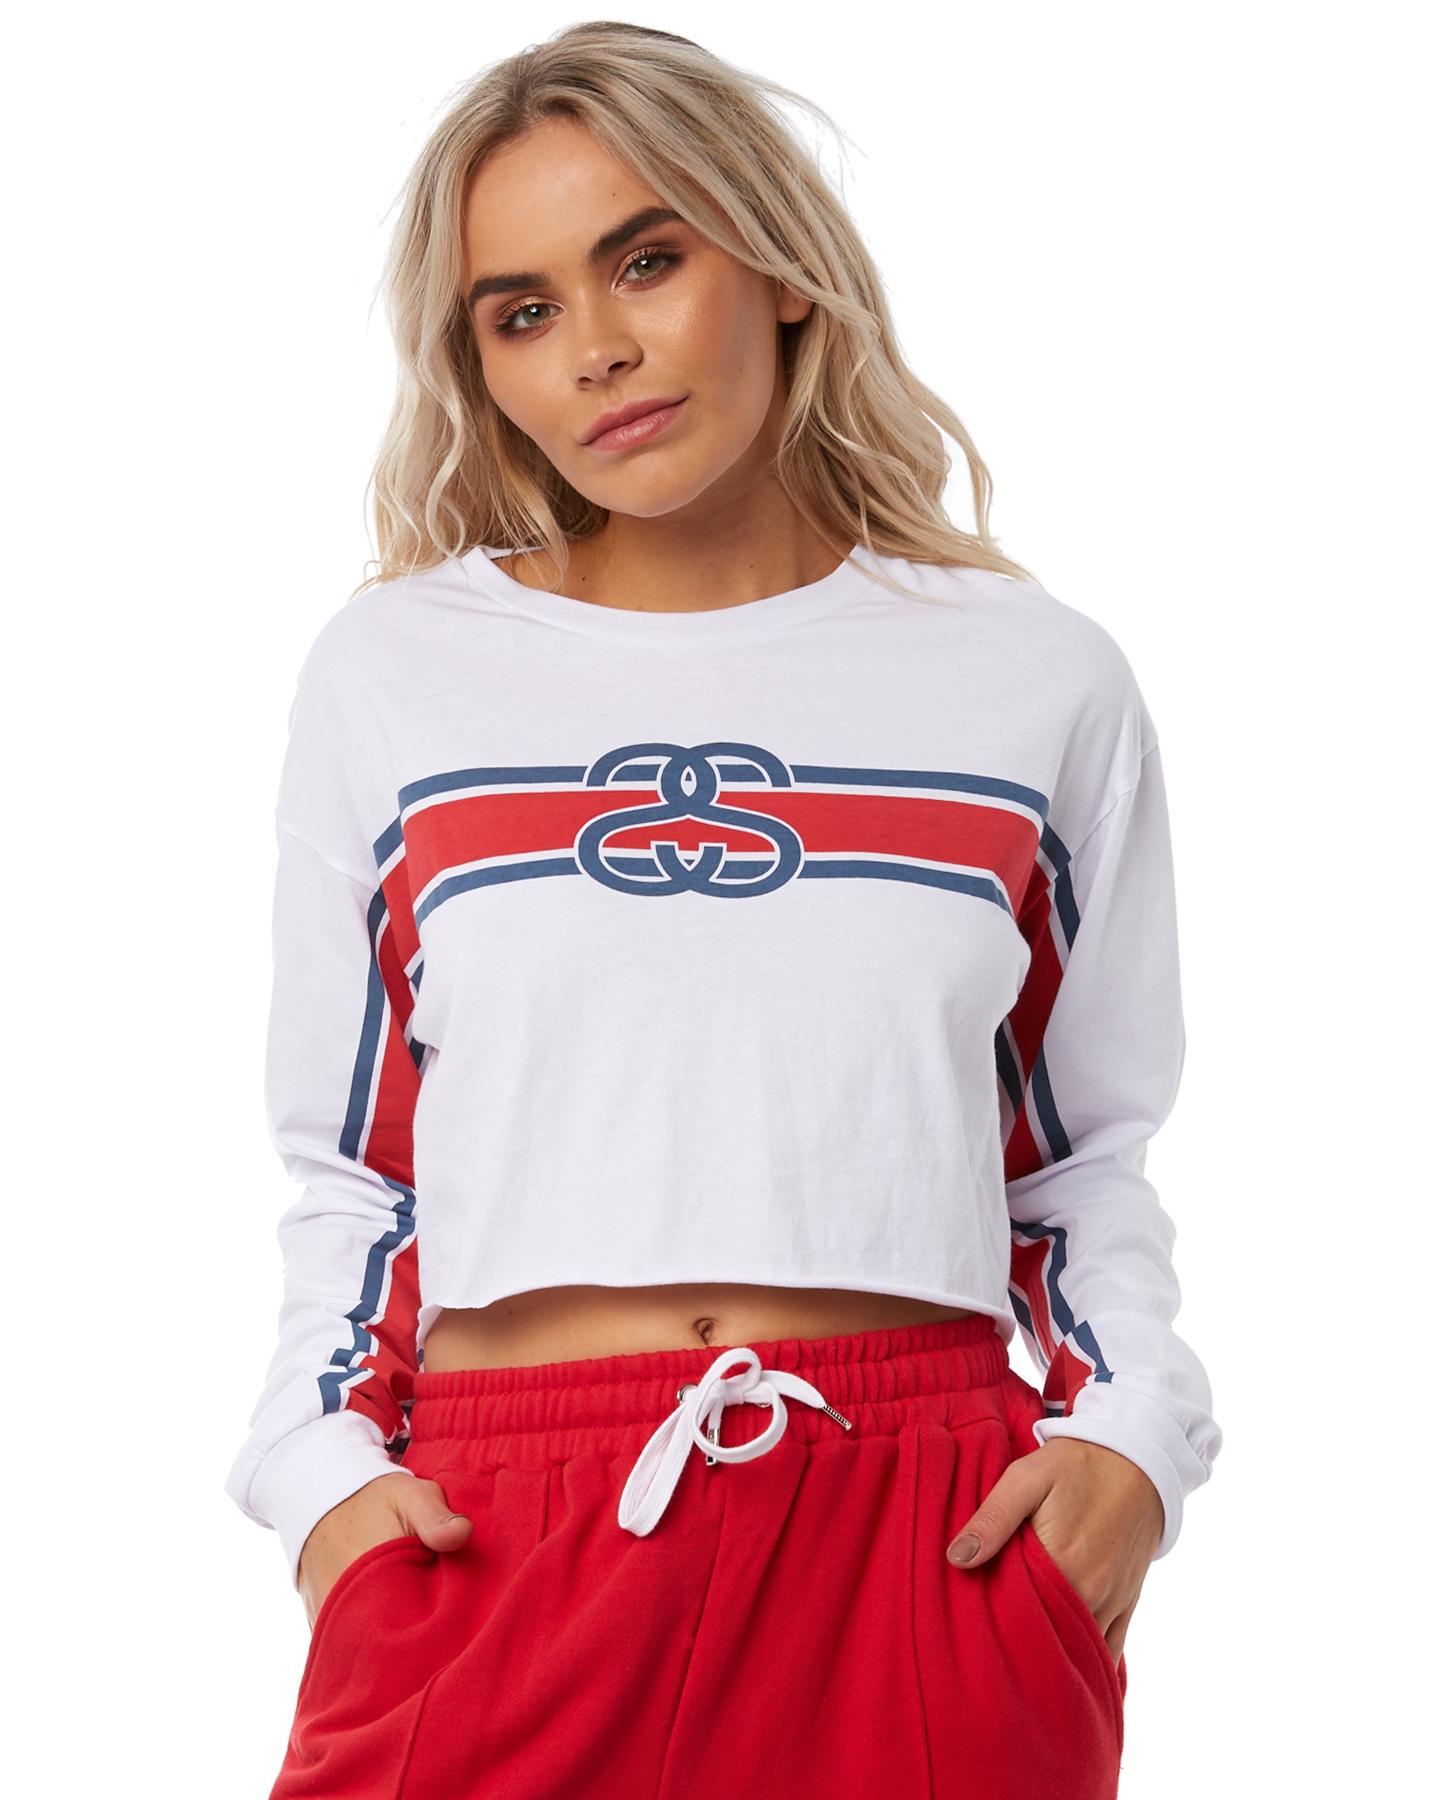 Stussy Tracks Crop Ls Tee White Womens shirts Size 10  5eeeeb3c7a